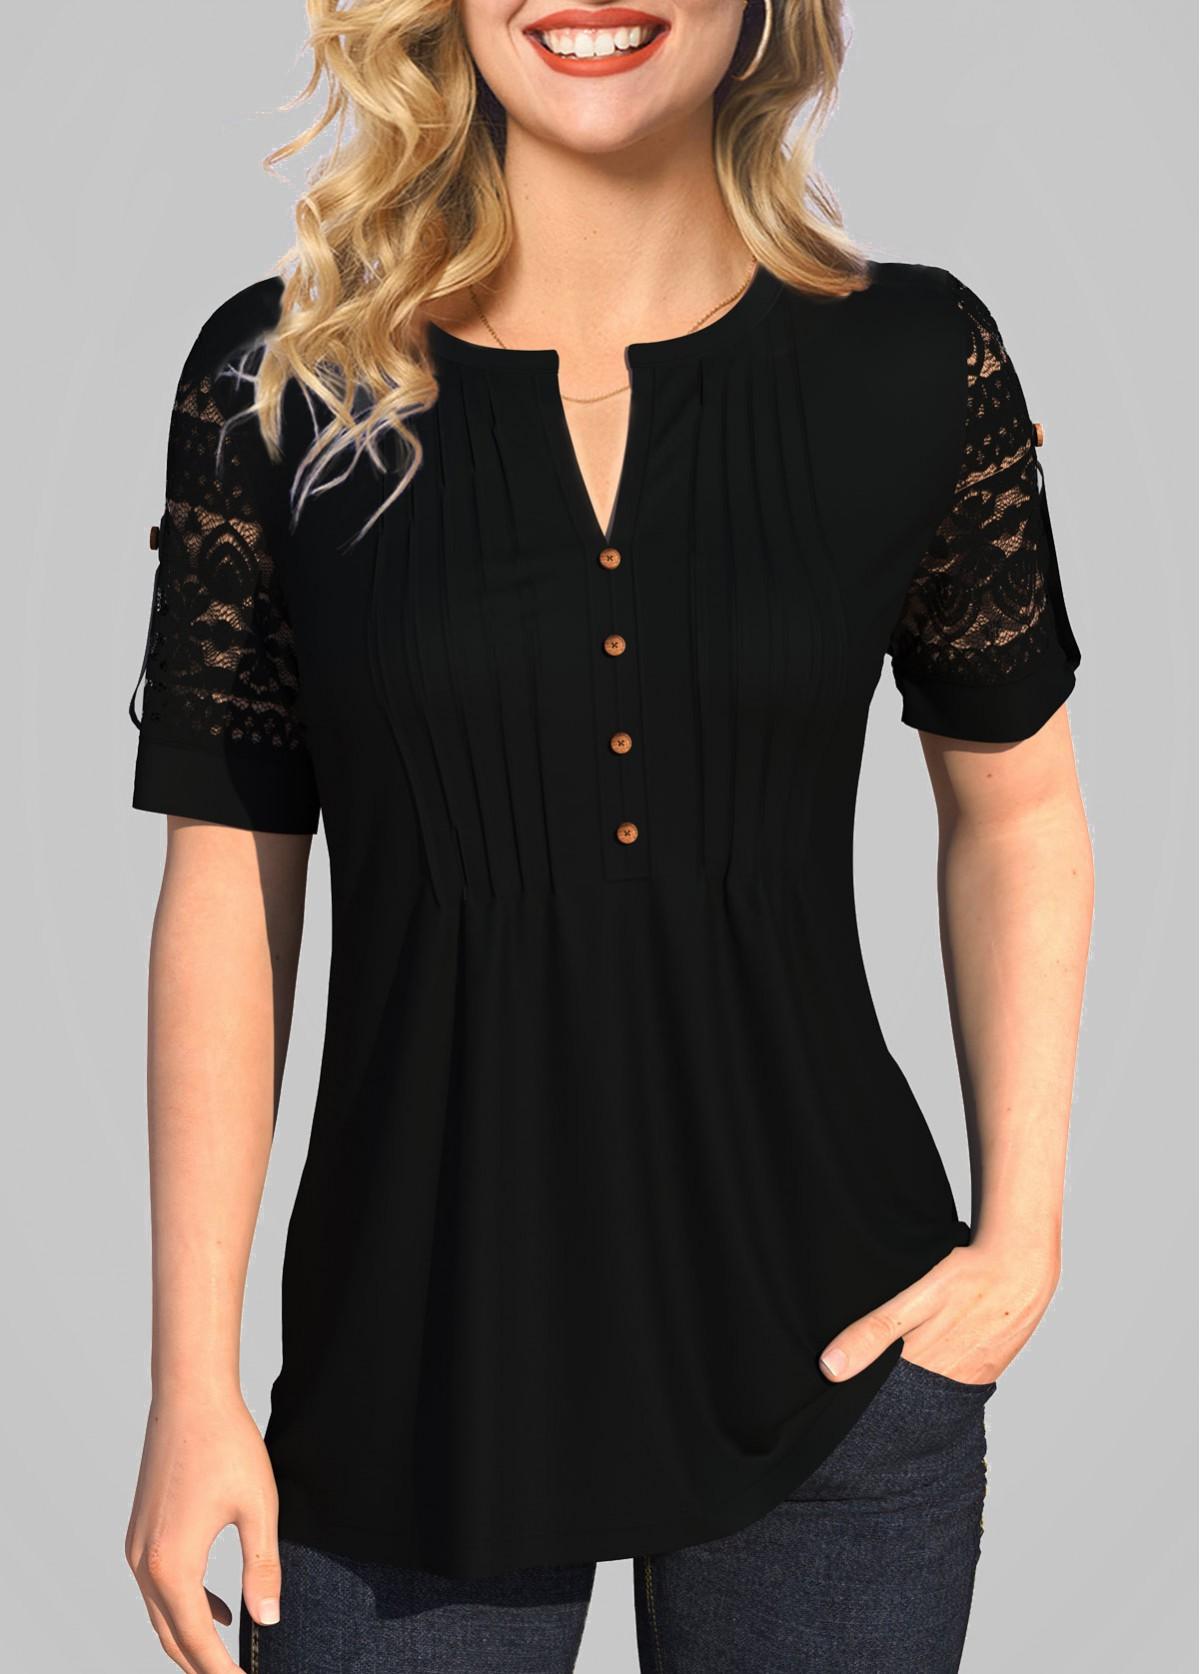 ROTITA Lace Patchwork Split Neck Solid T Shirt